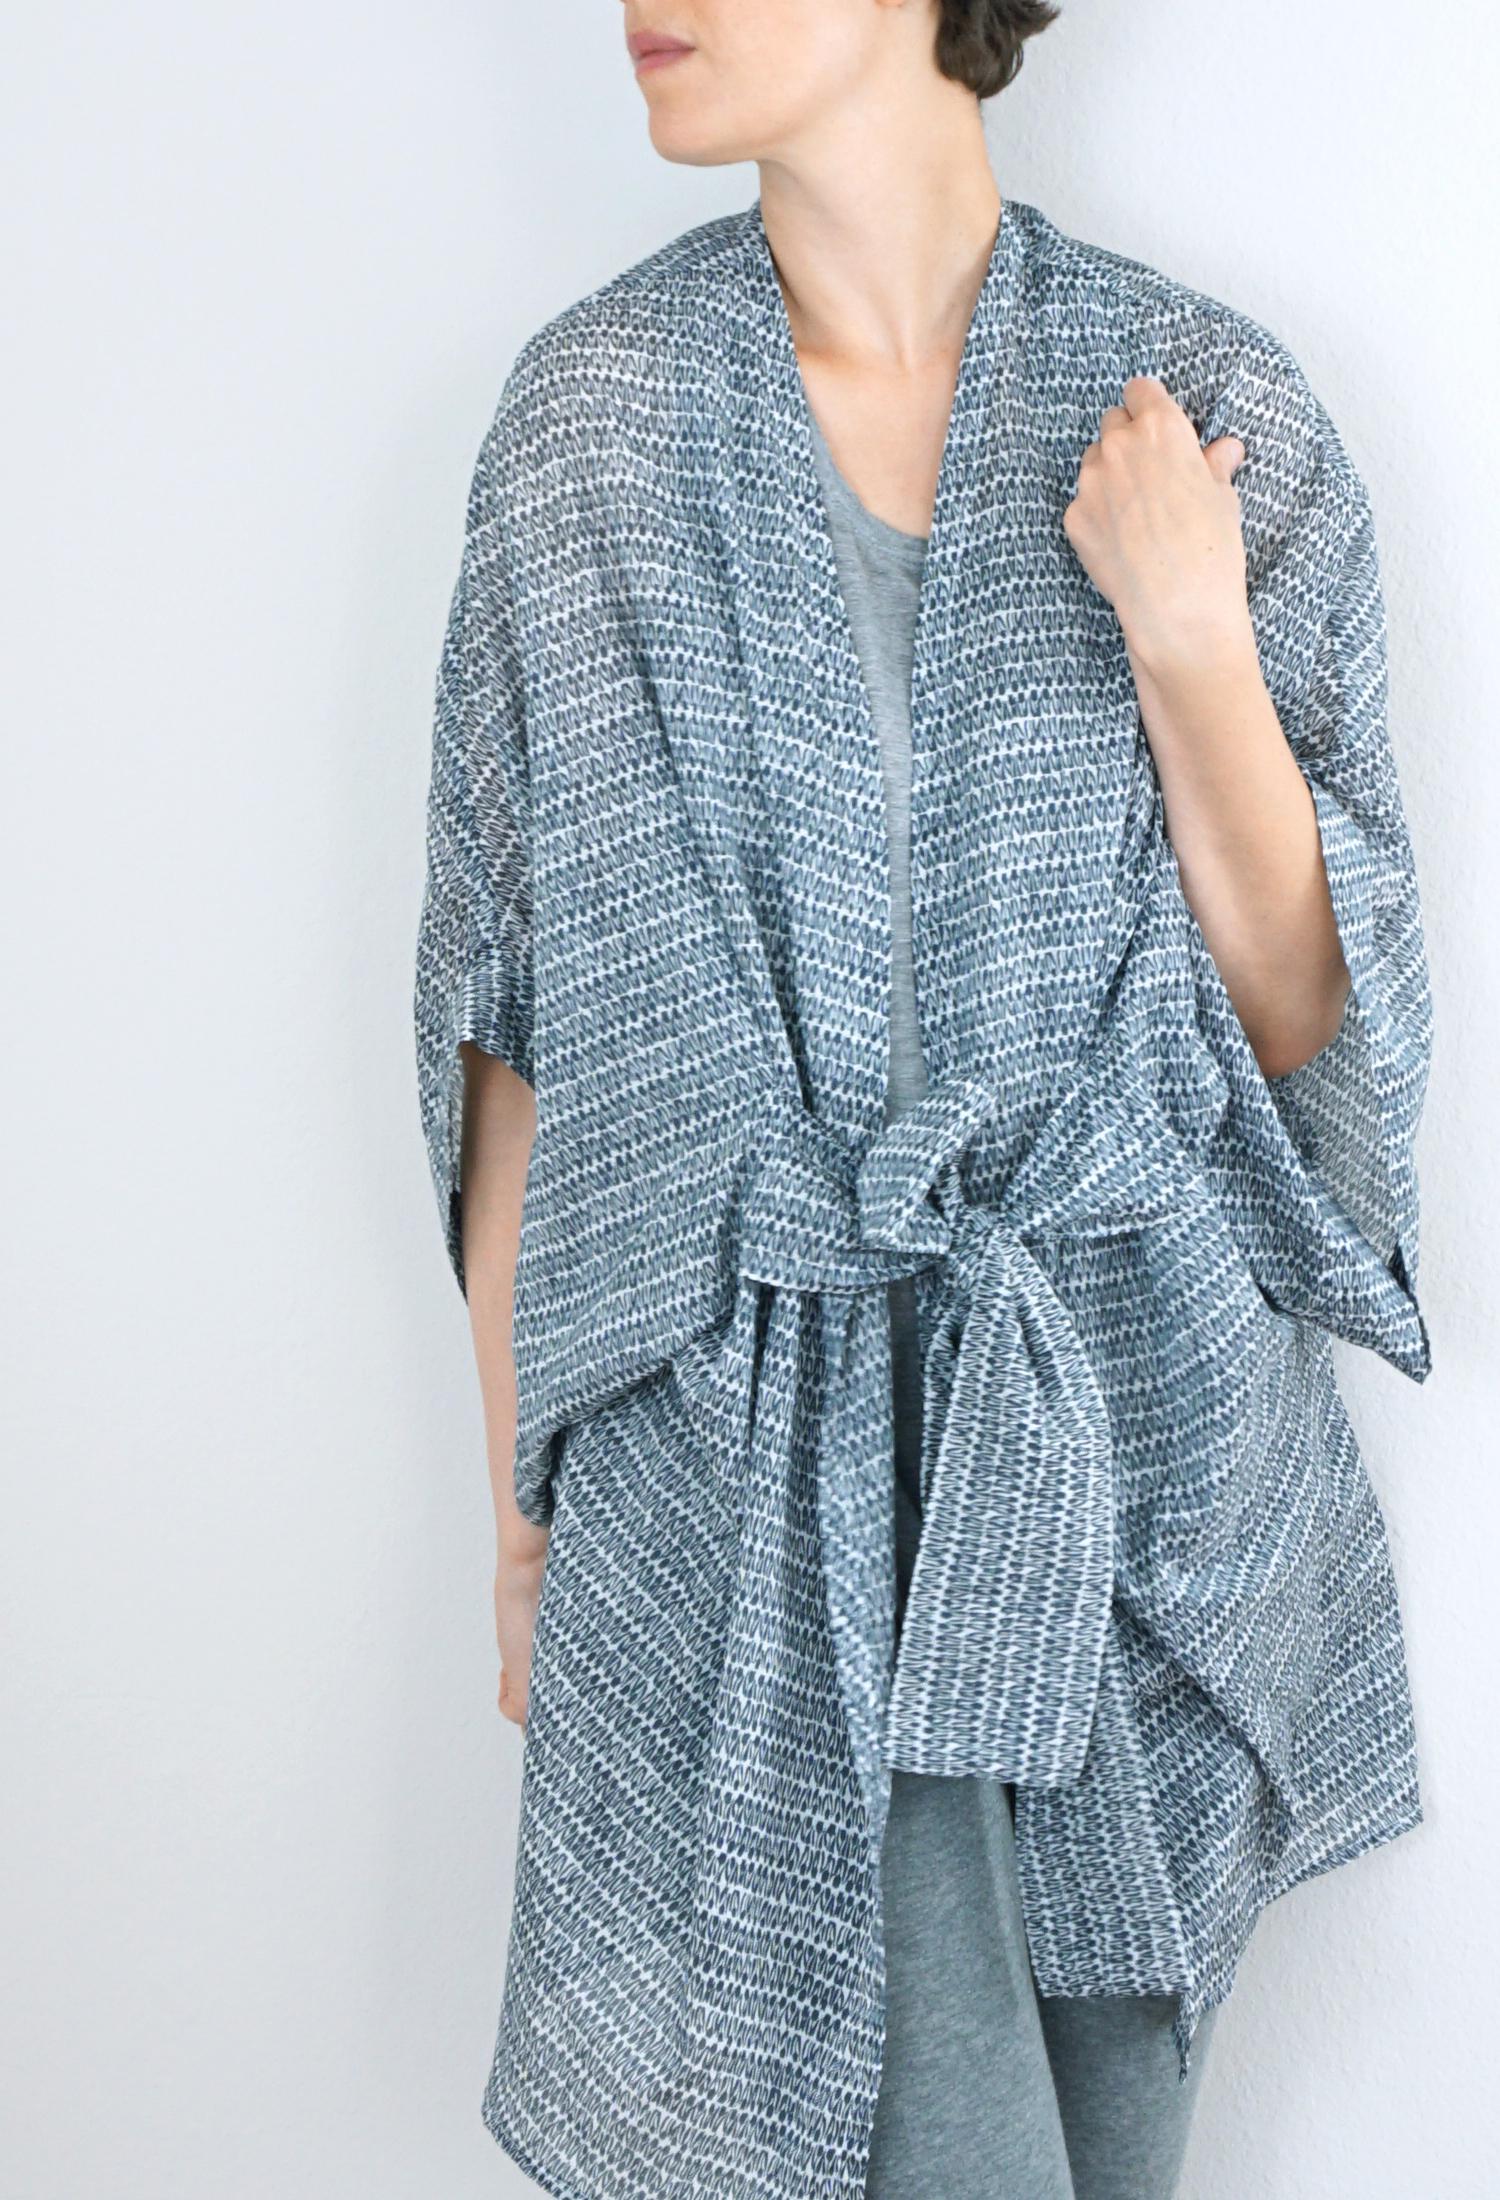 Sewing Kimono Robe Pattern